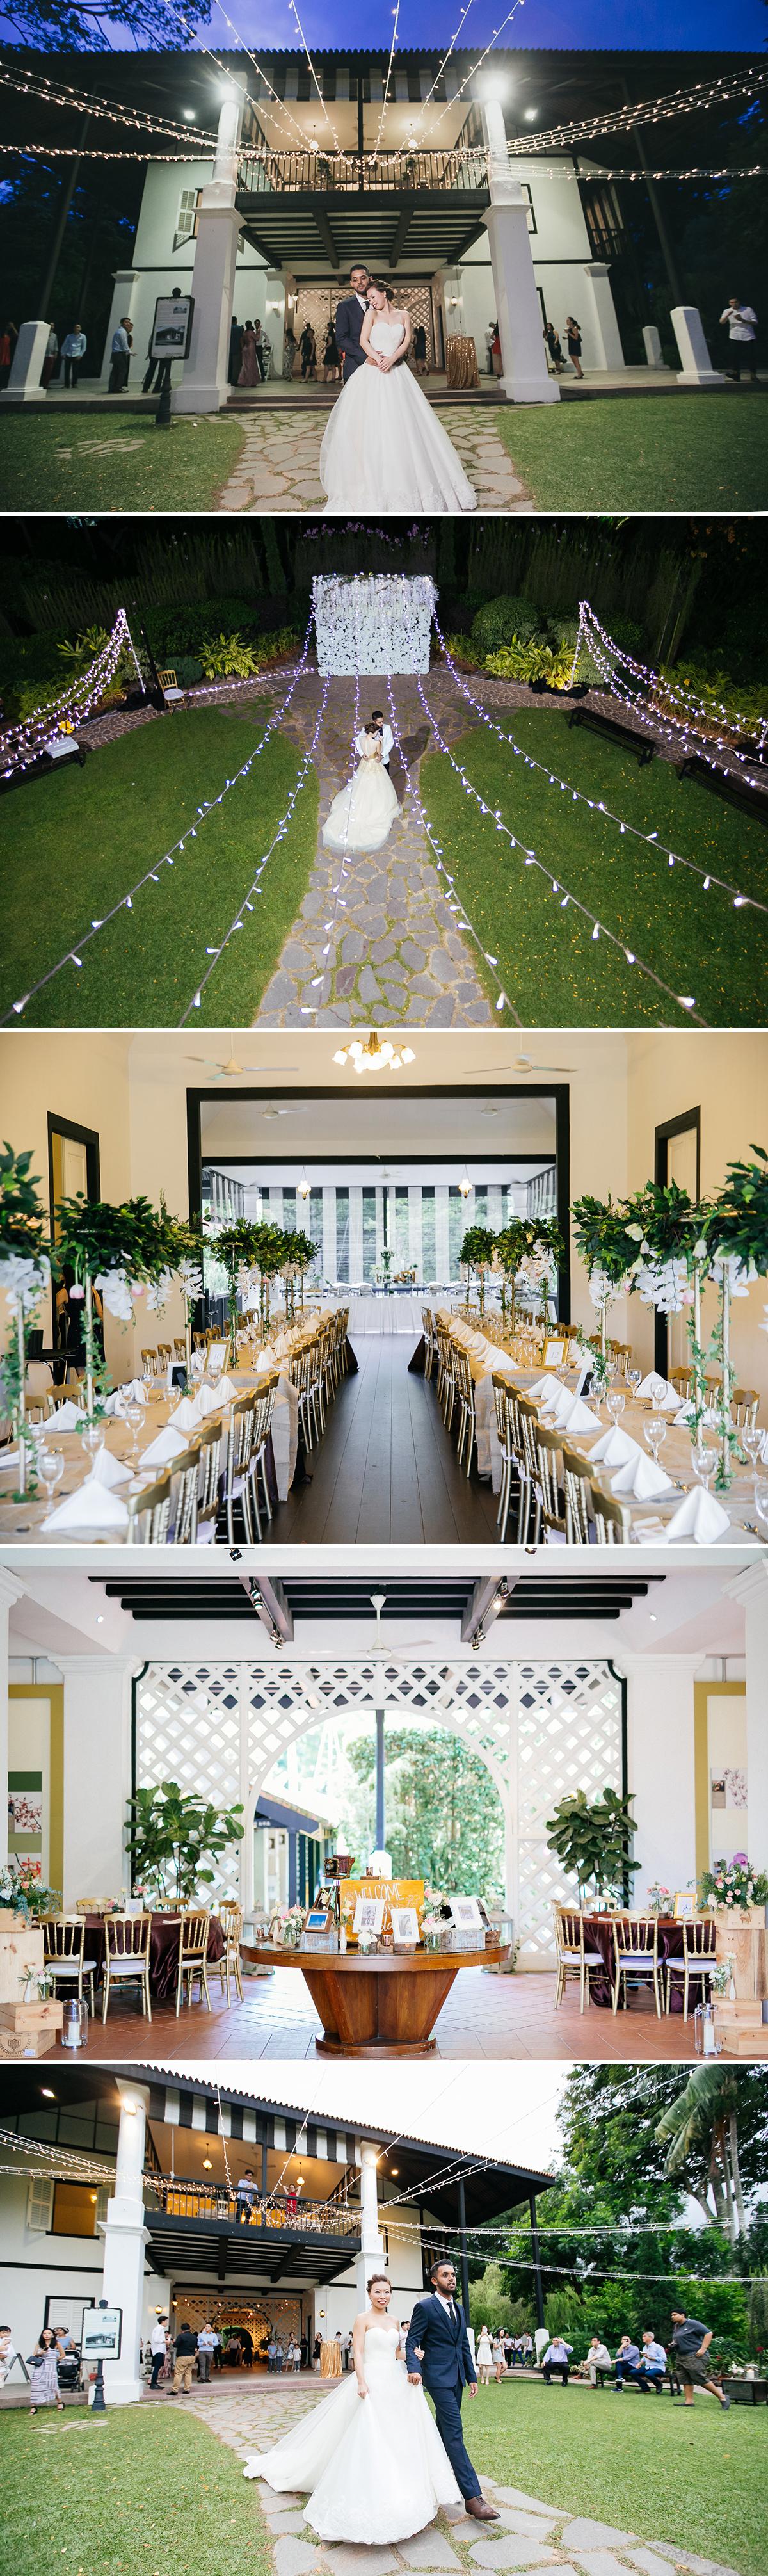 wedding reception photo booth singapore%0A Burkill Hall at Botanic Gardens    Garden wedding venues in Singapore